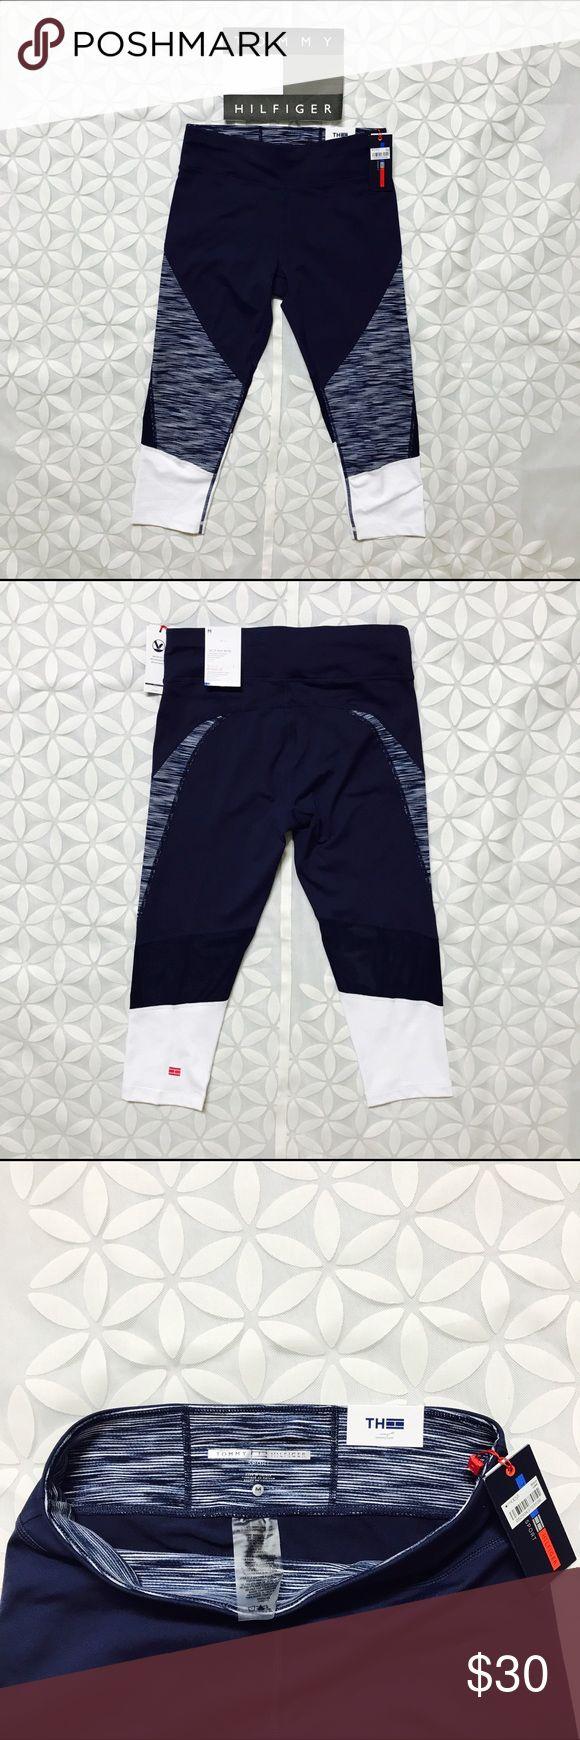 (M) Tommy Hilfiger Sport Leggings NWT NWT Price is firm Tommy Hilfiger Pants Leggings